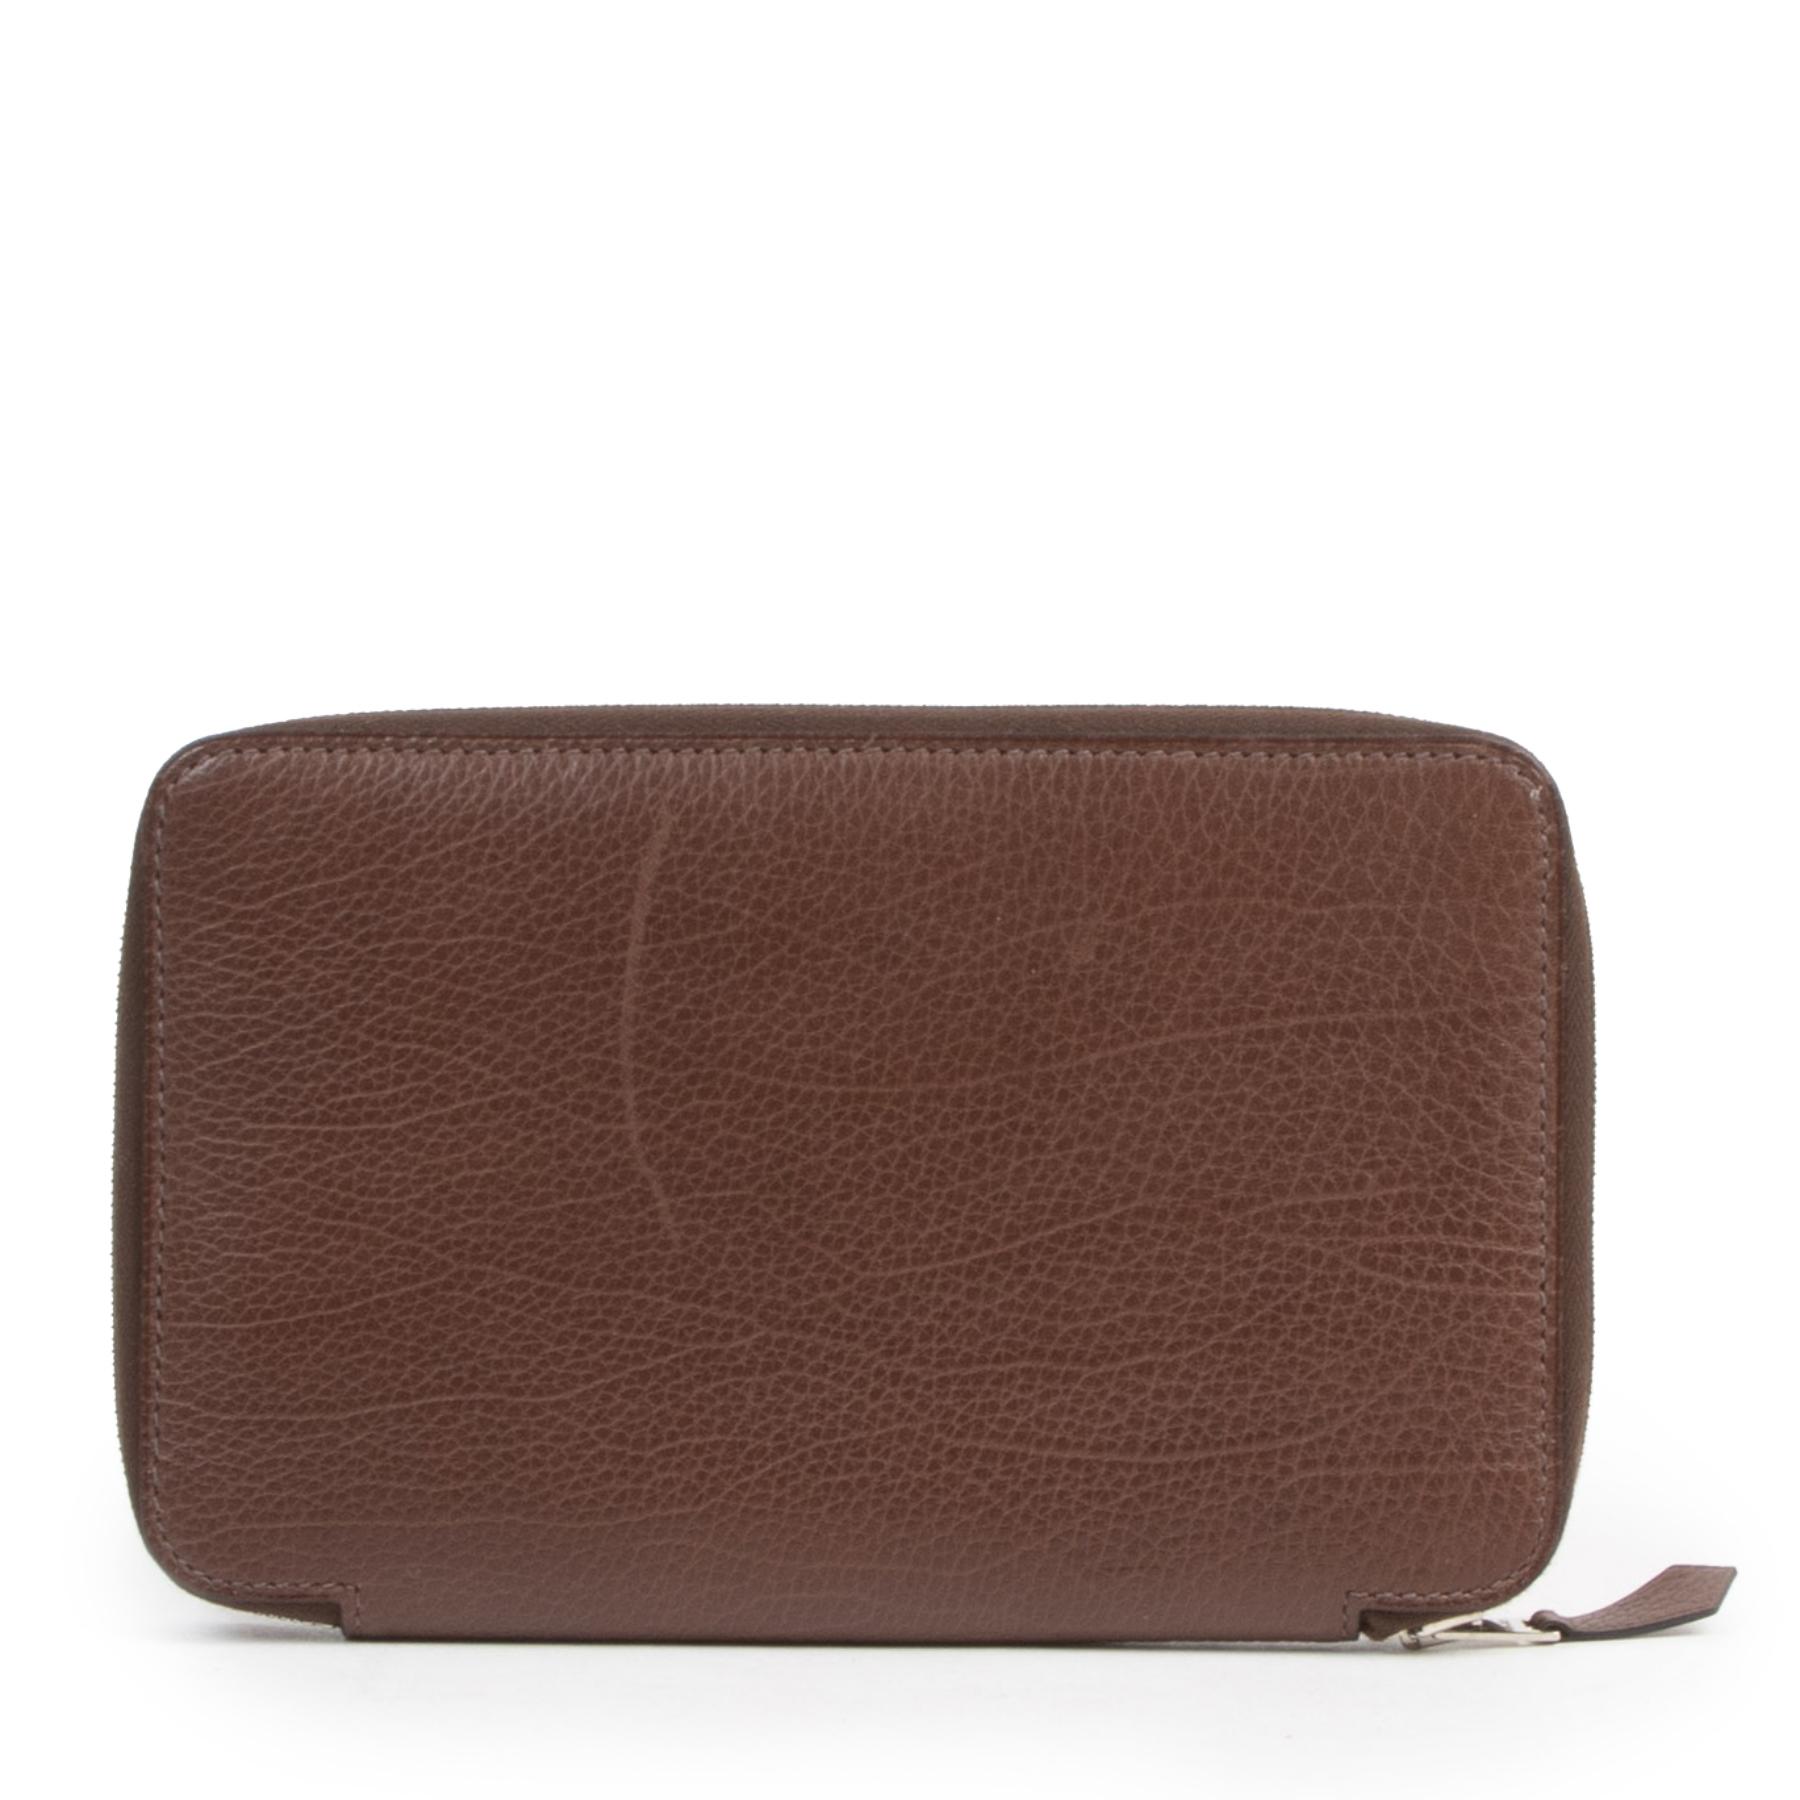 Authentic secondhand Hermès Brown Leather Agenda Cover designer bags fashion luxury vintage webshop safe secure online shopping high end brands